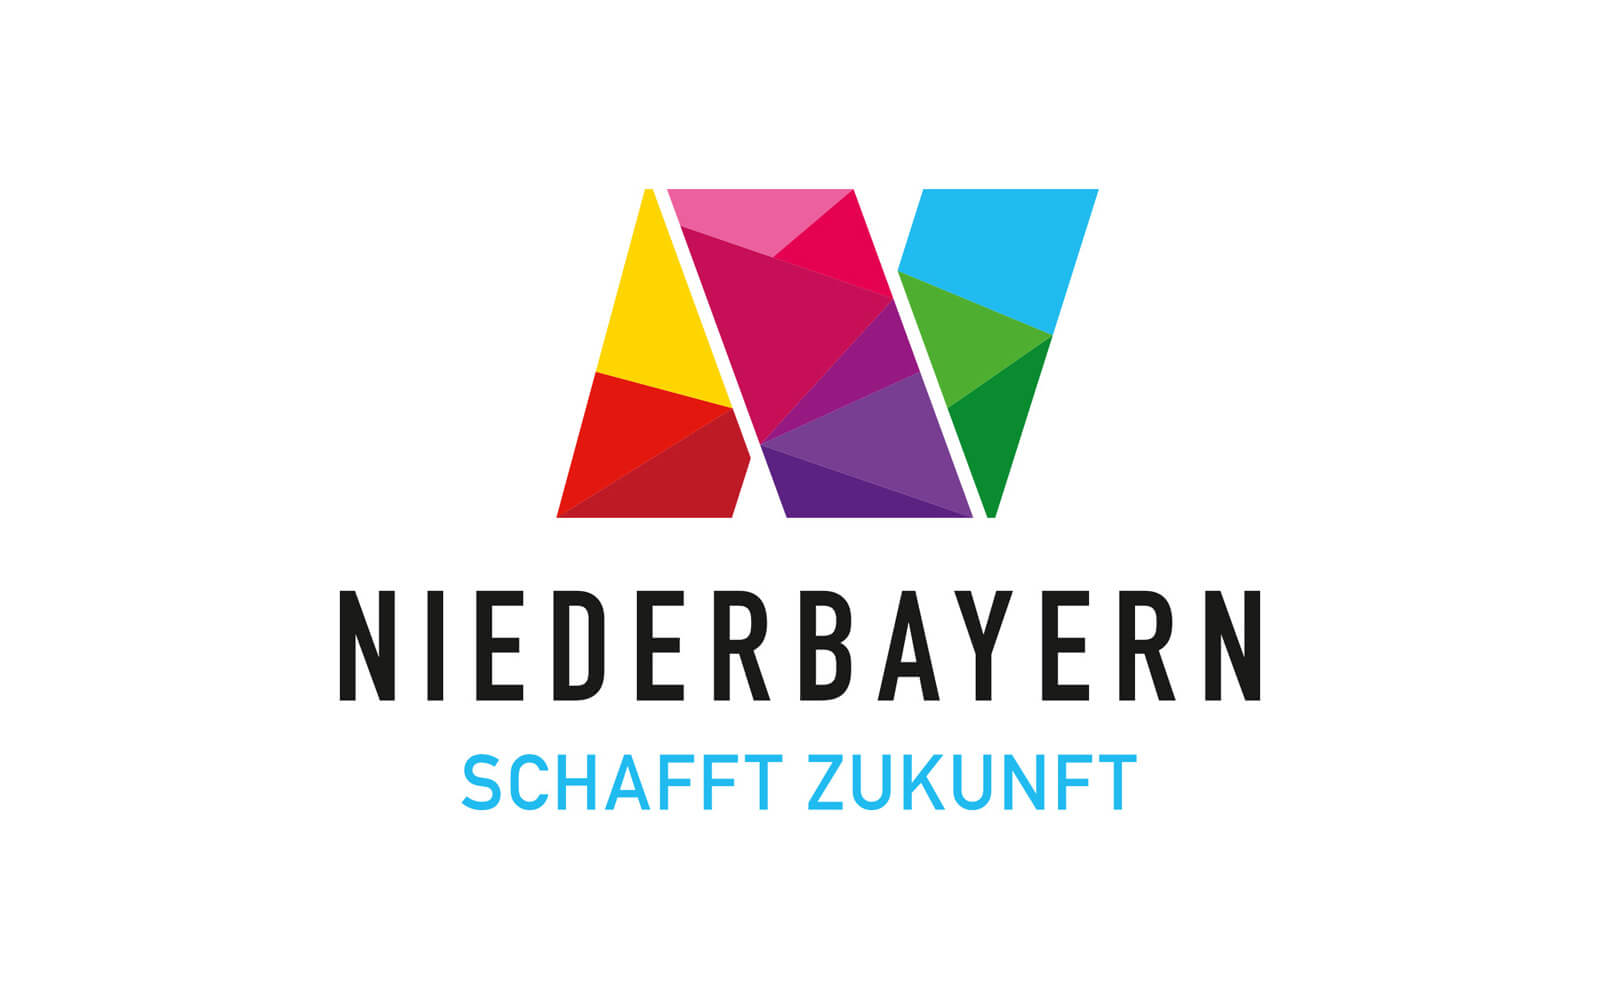 Niederbayern Logo – Dachmarke »Schafft Zukunft«